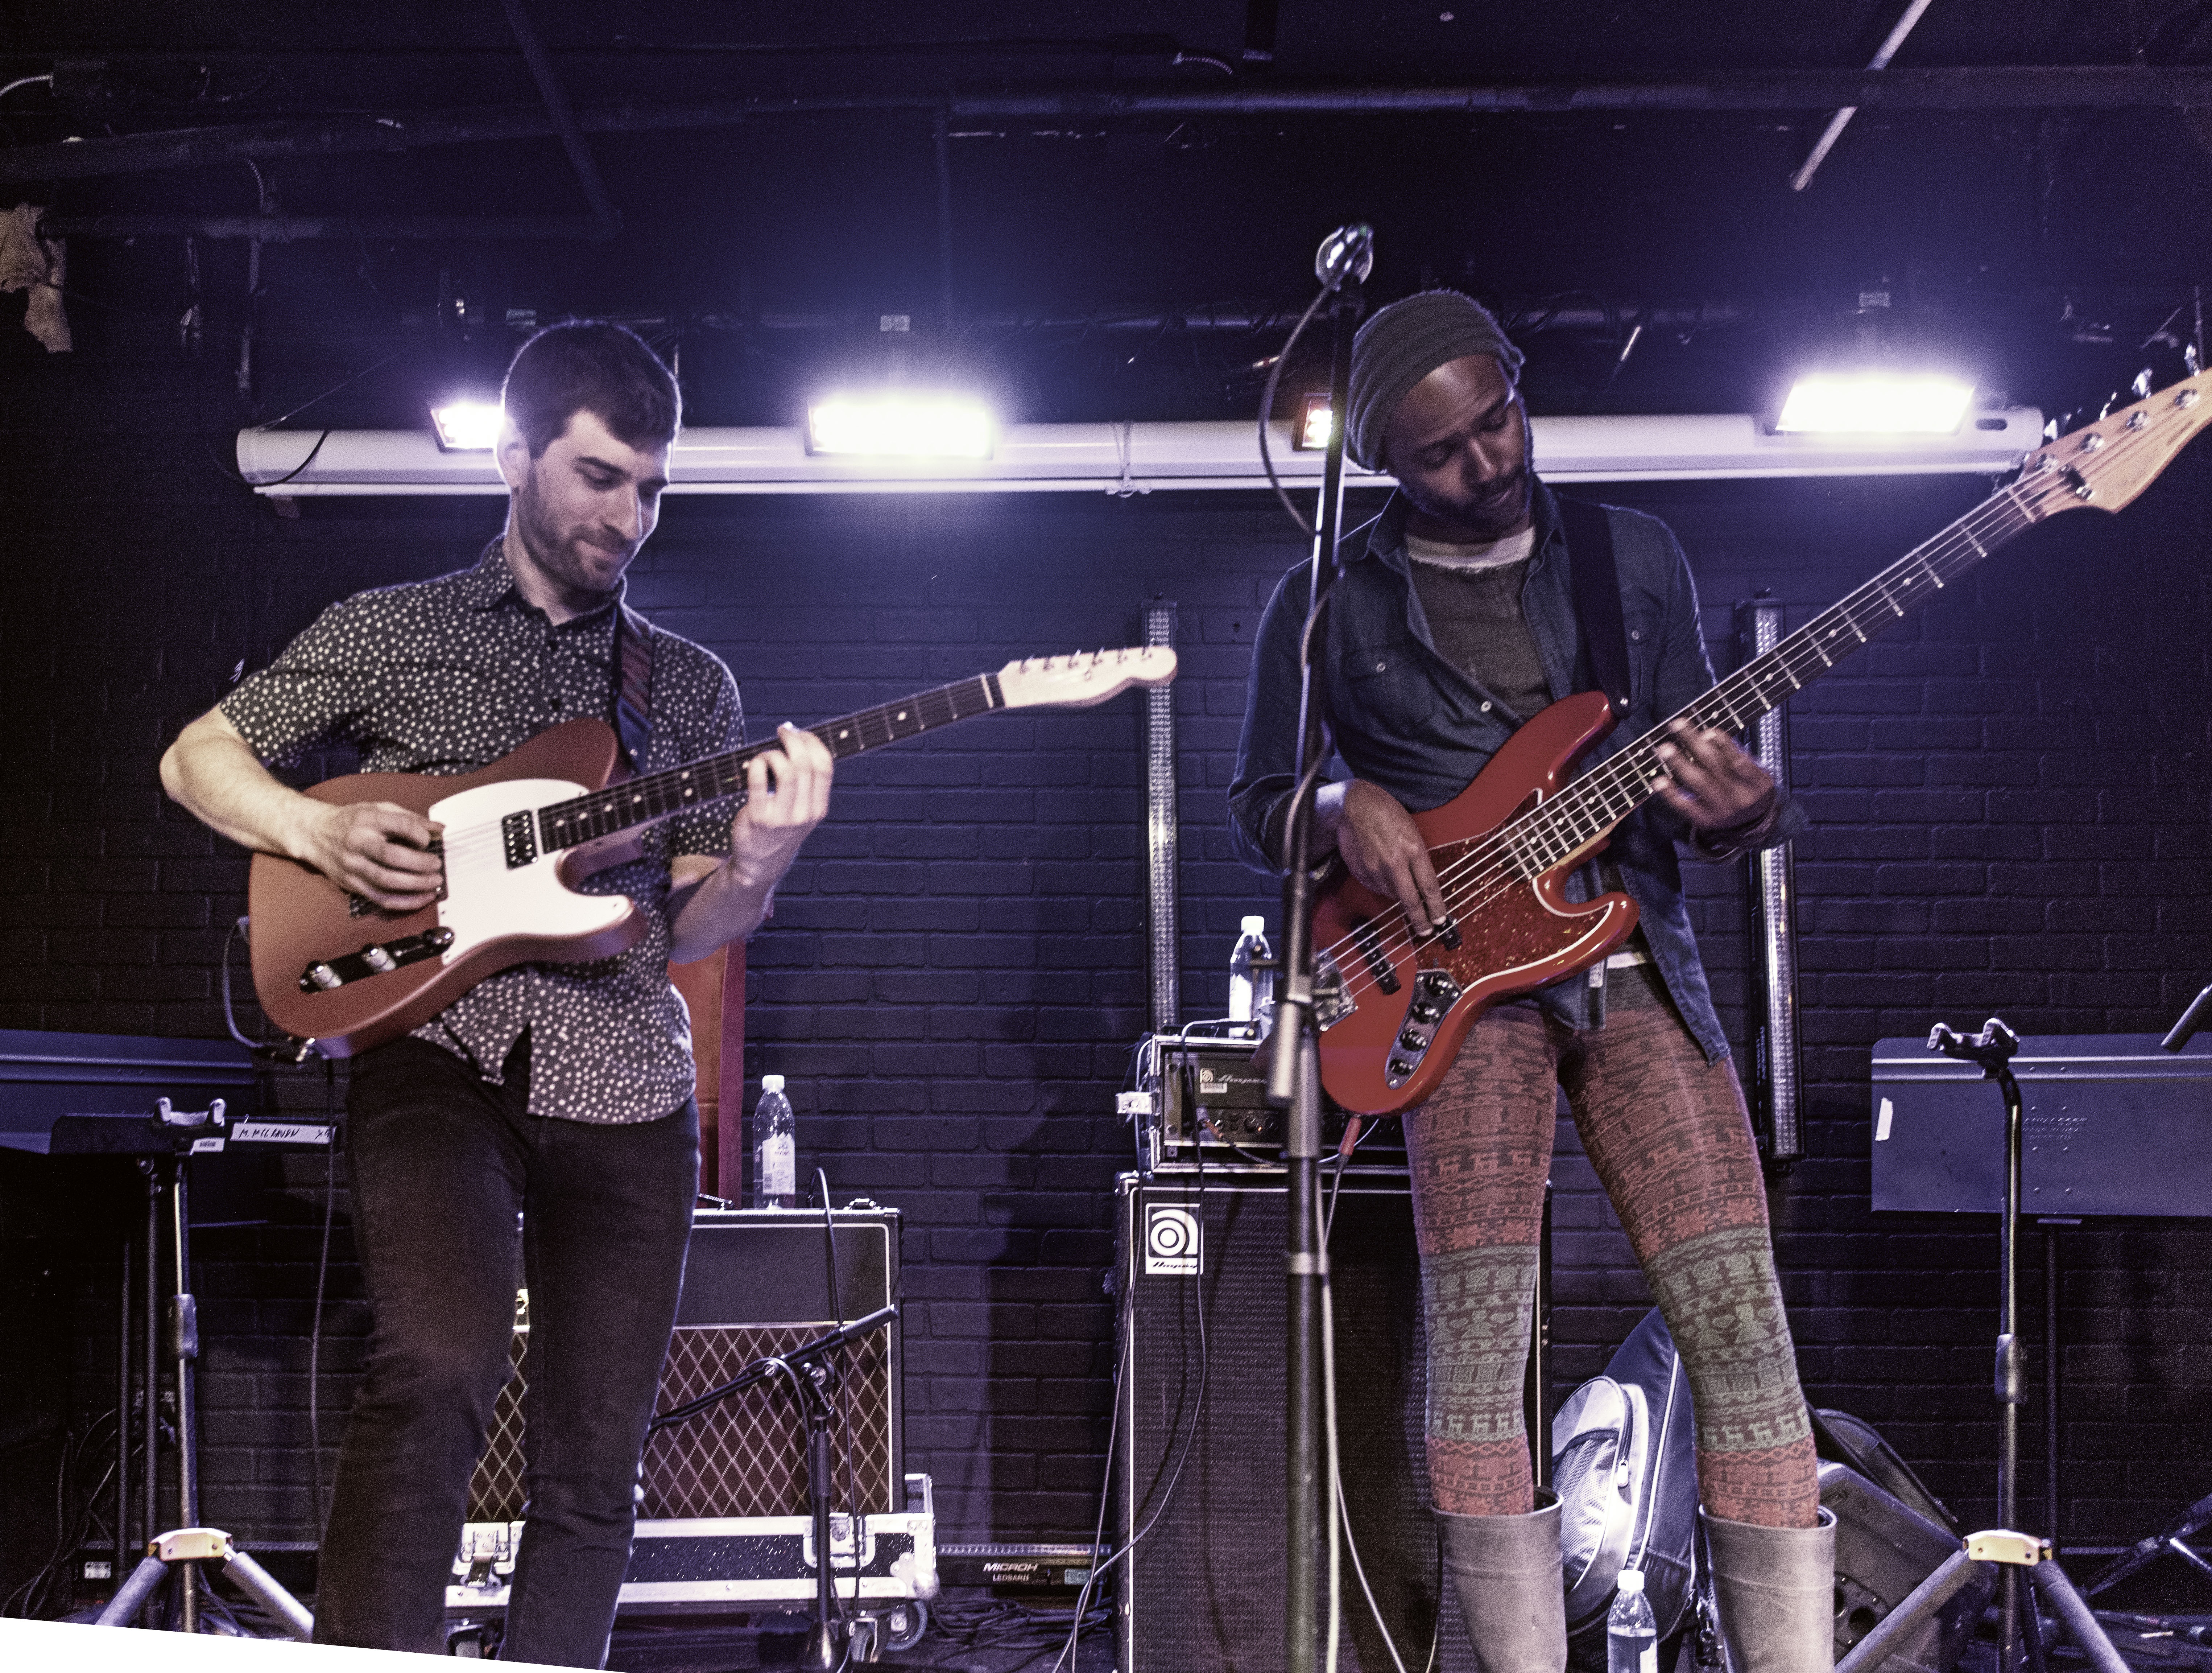 Matt Gold and Junius Paul with Makaya McCraven at the Toronto Jazz Festival 2019